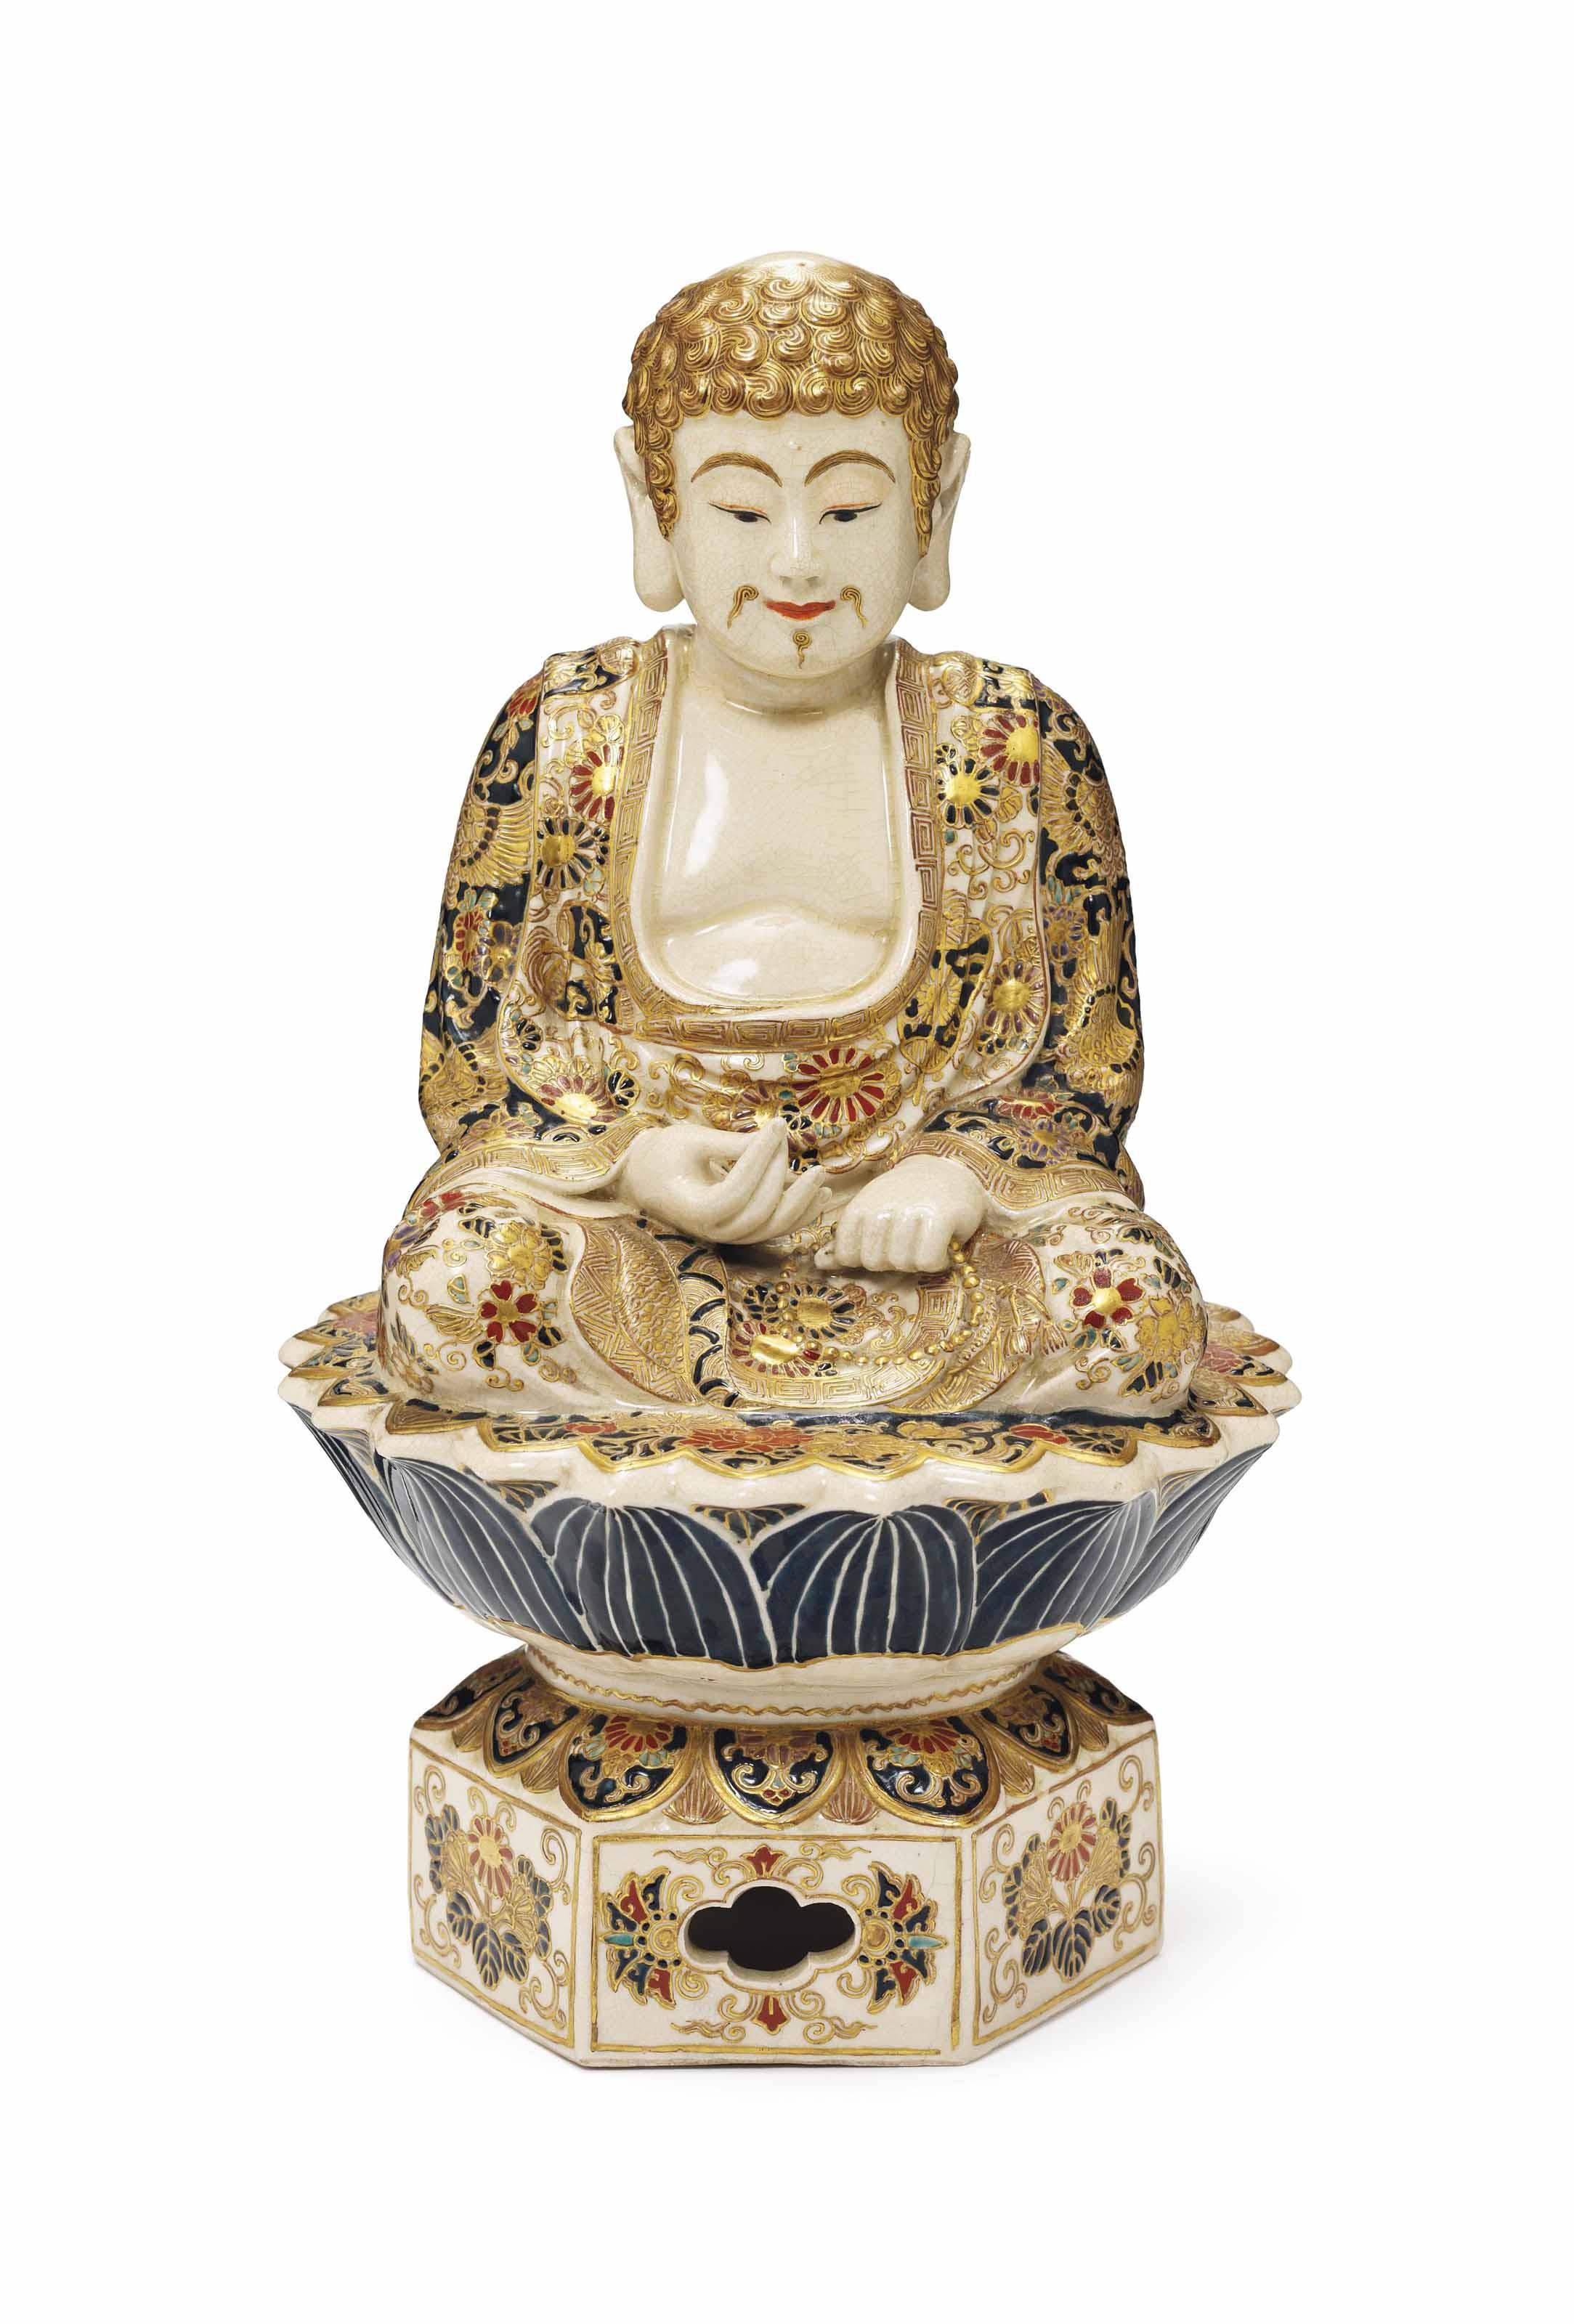 A Satsuma Okimono [Sculptural Ornament]